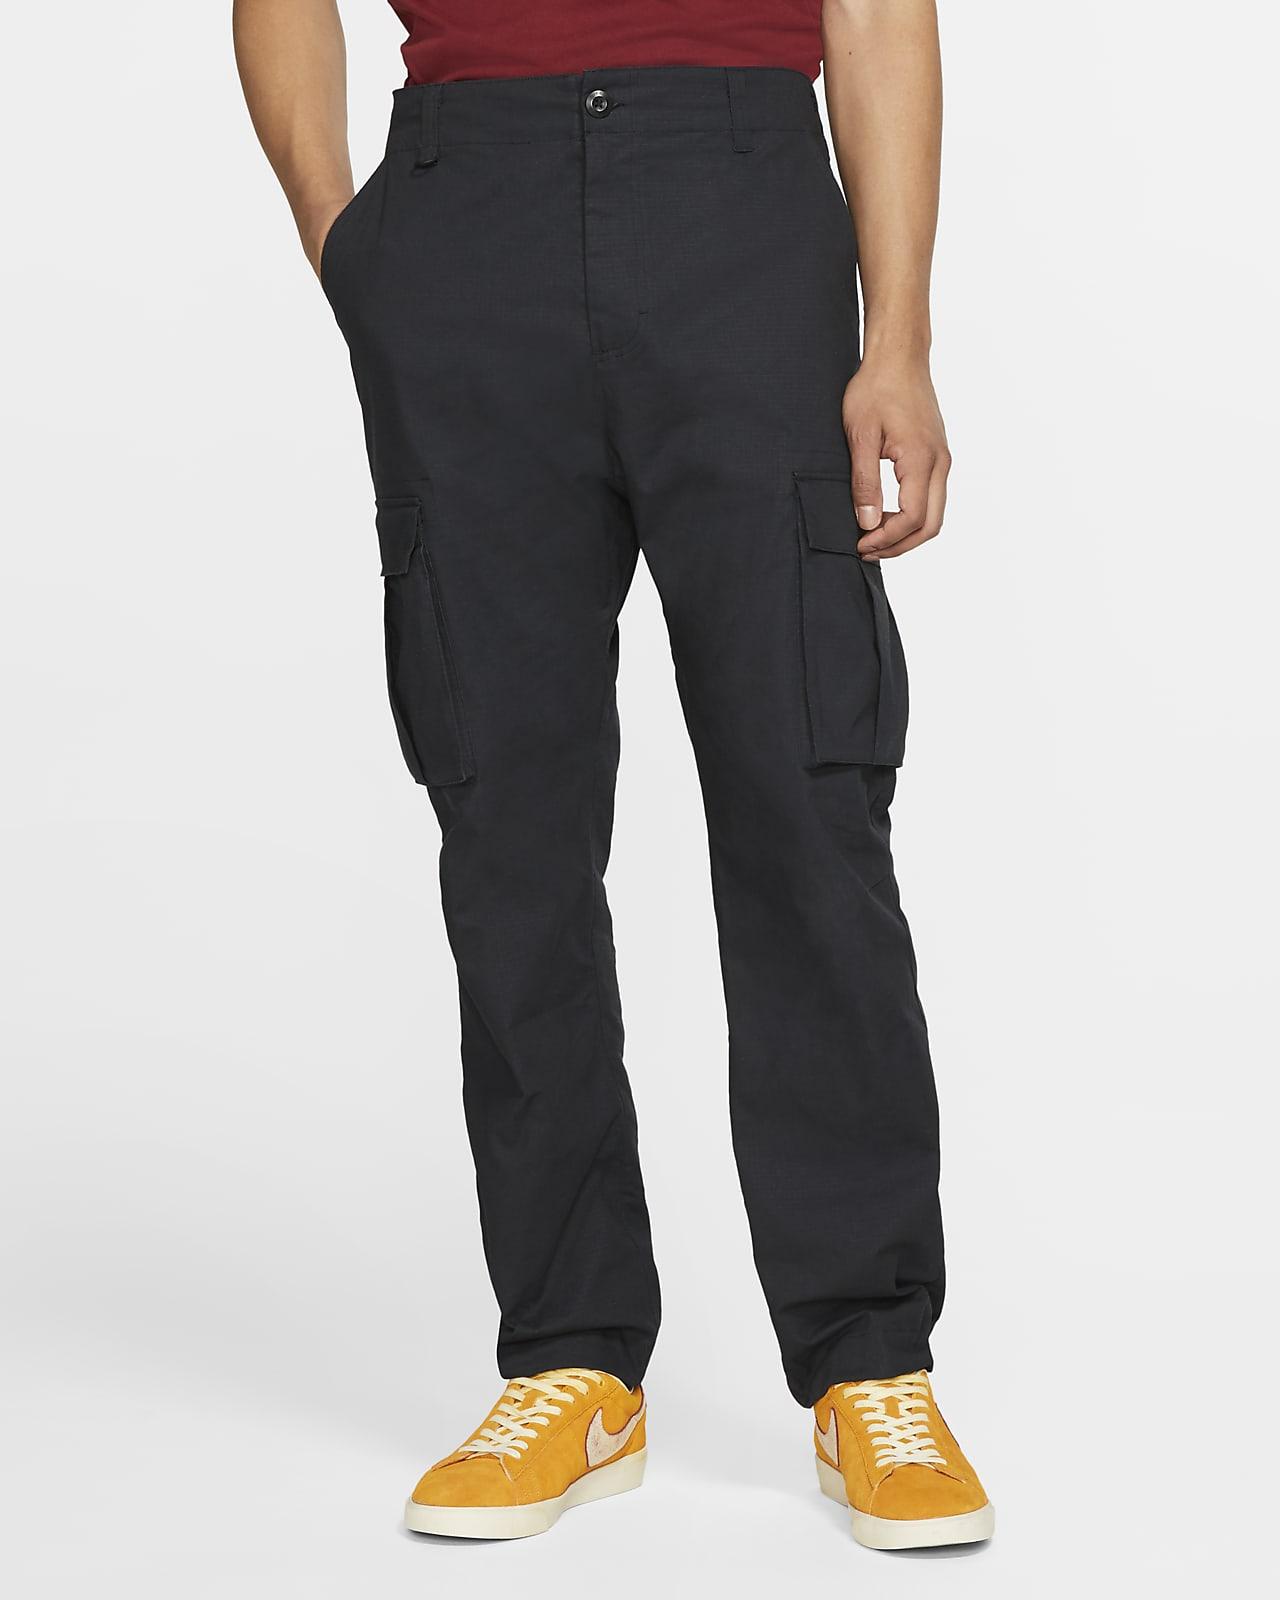 Nike SB Flex FTM Skate Cargo Pants. Nike JP